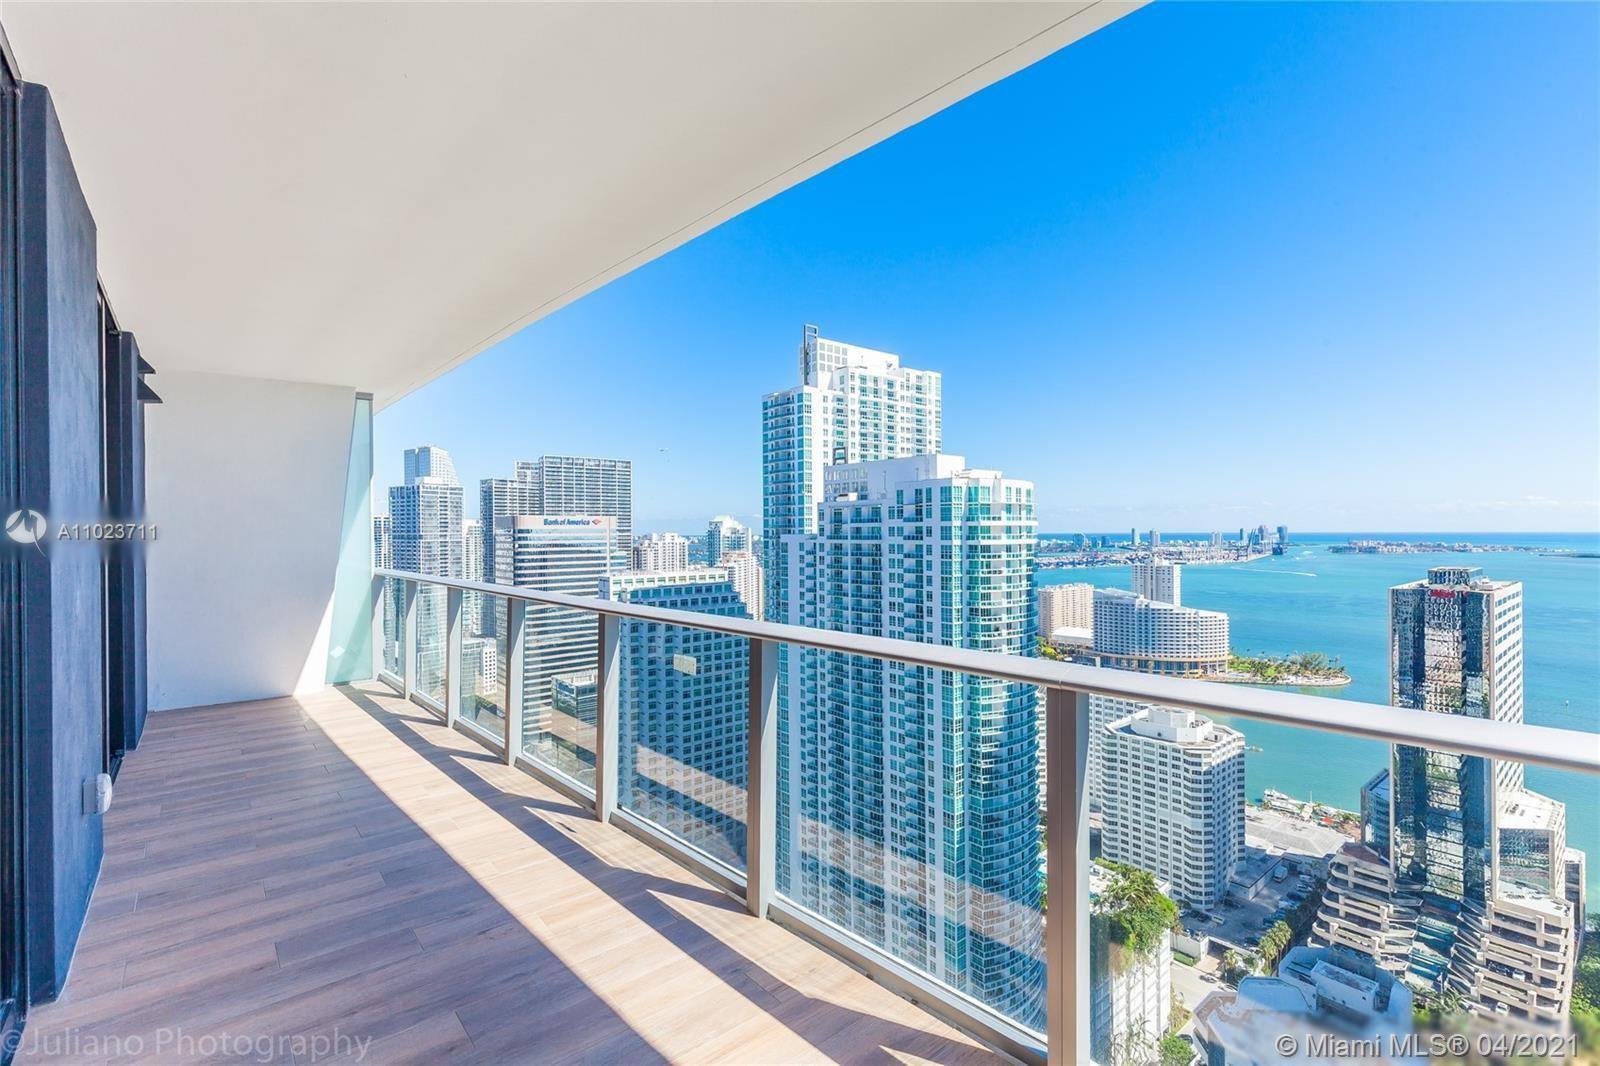 1010 Brickell #4204 - 1010 Brickell Ave #4204, Miami, FL 33131